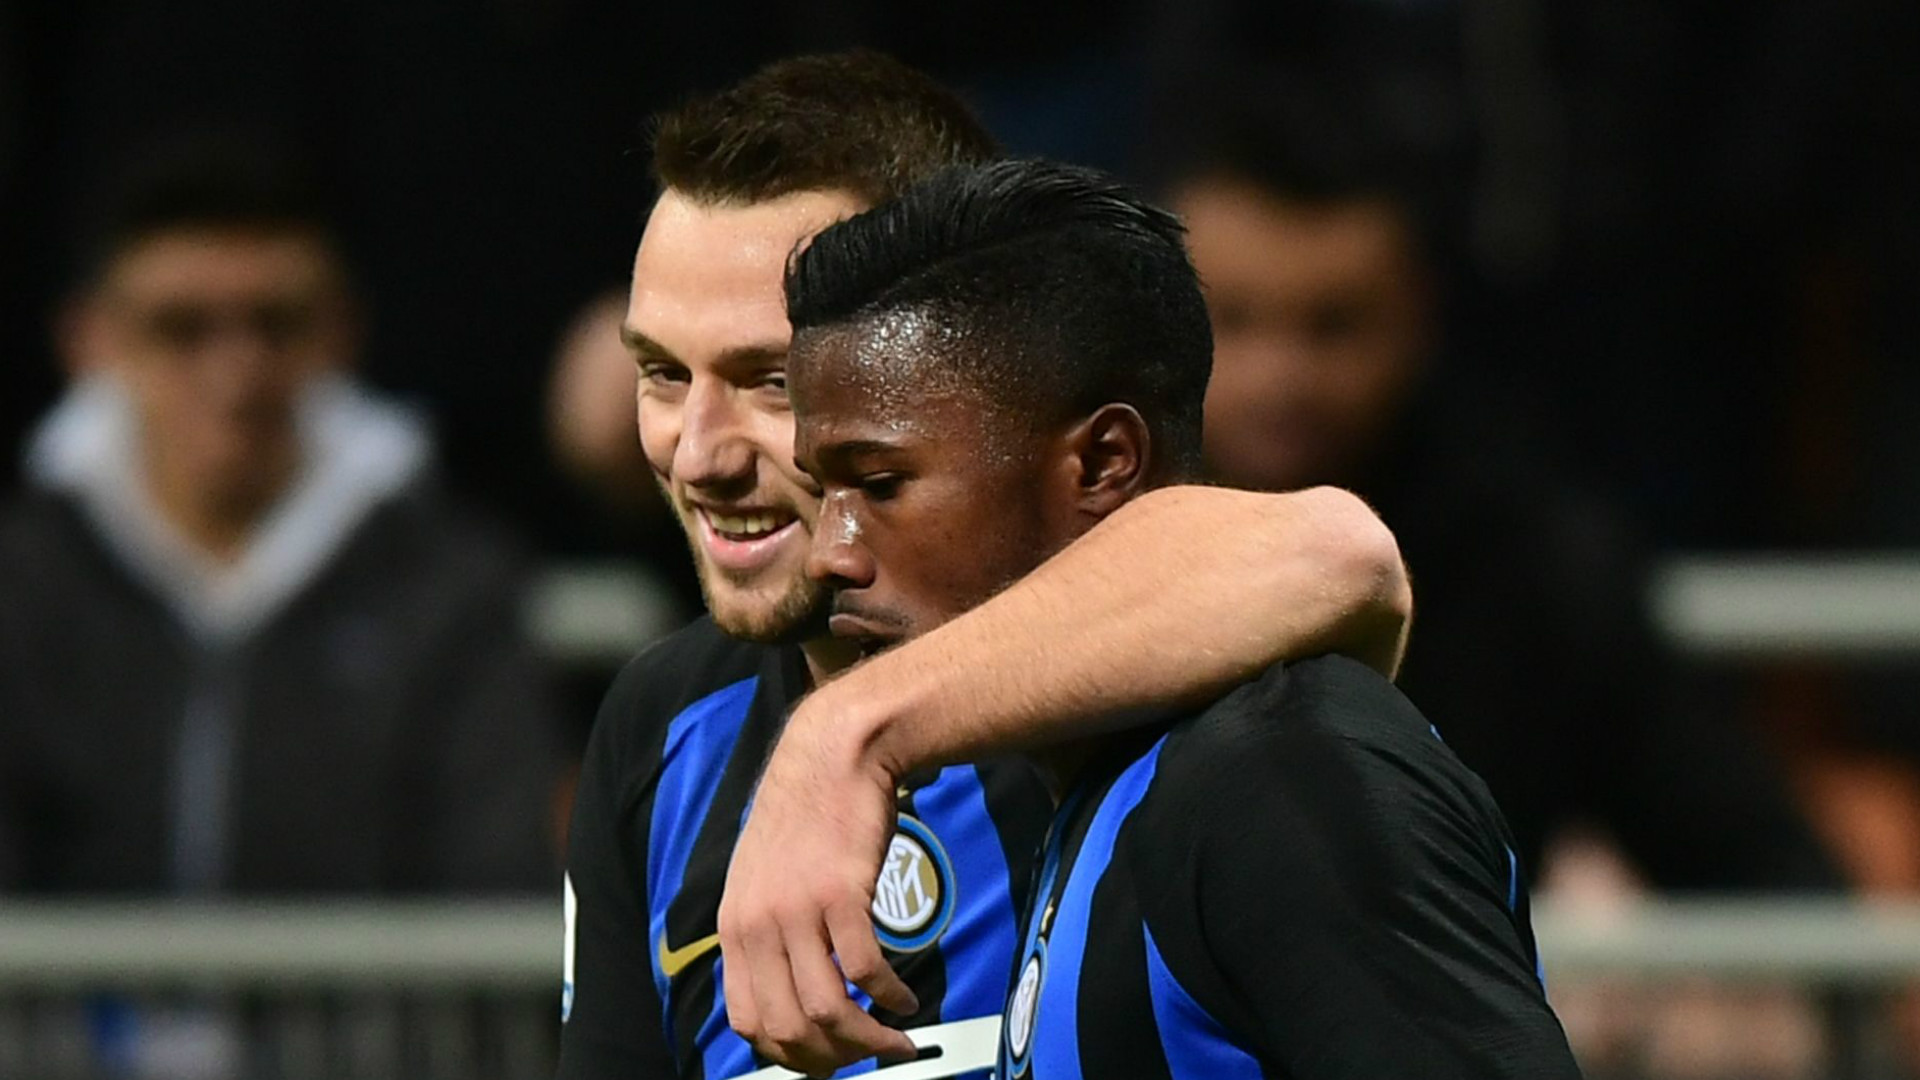 Keita Balde Diao Inter 2018-19